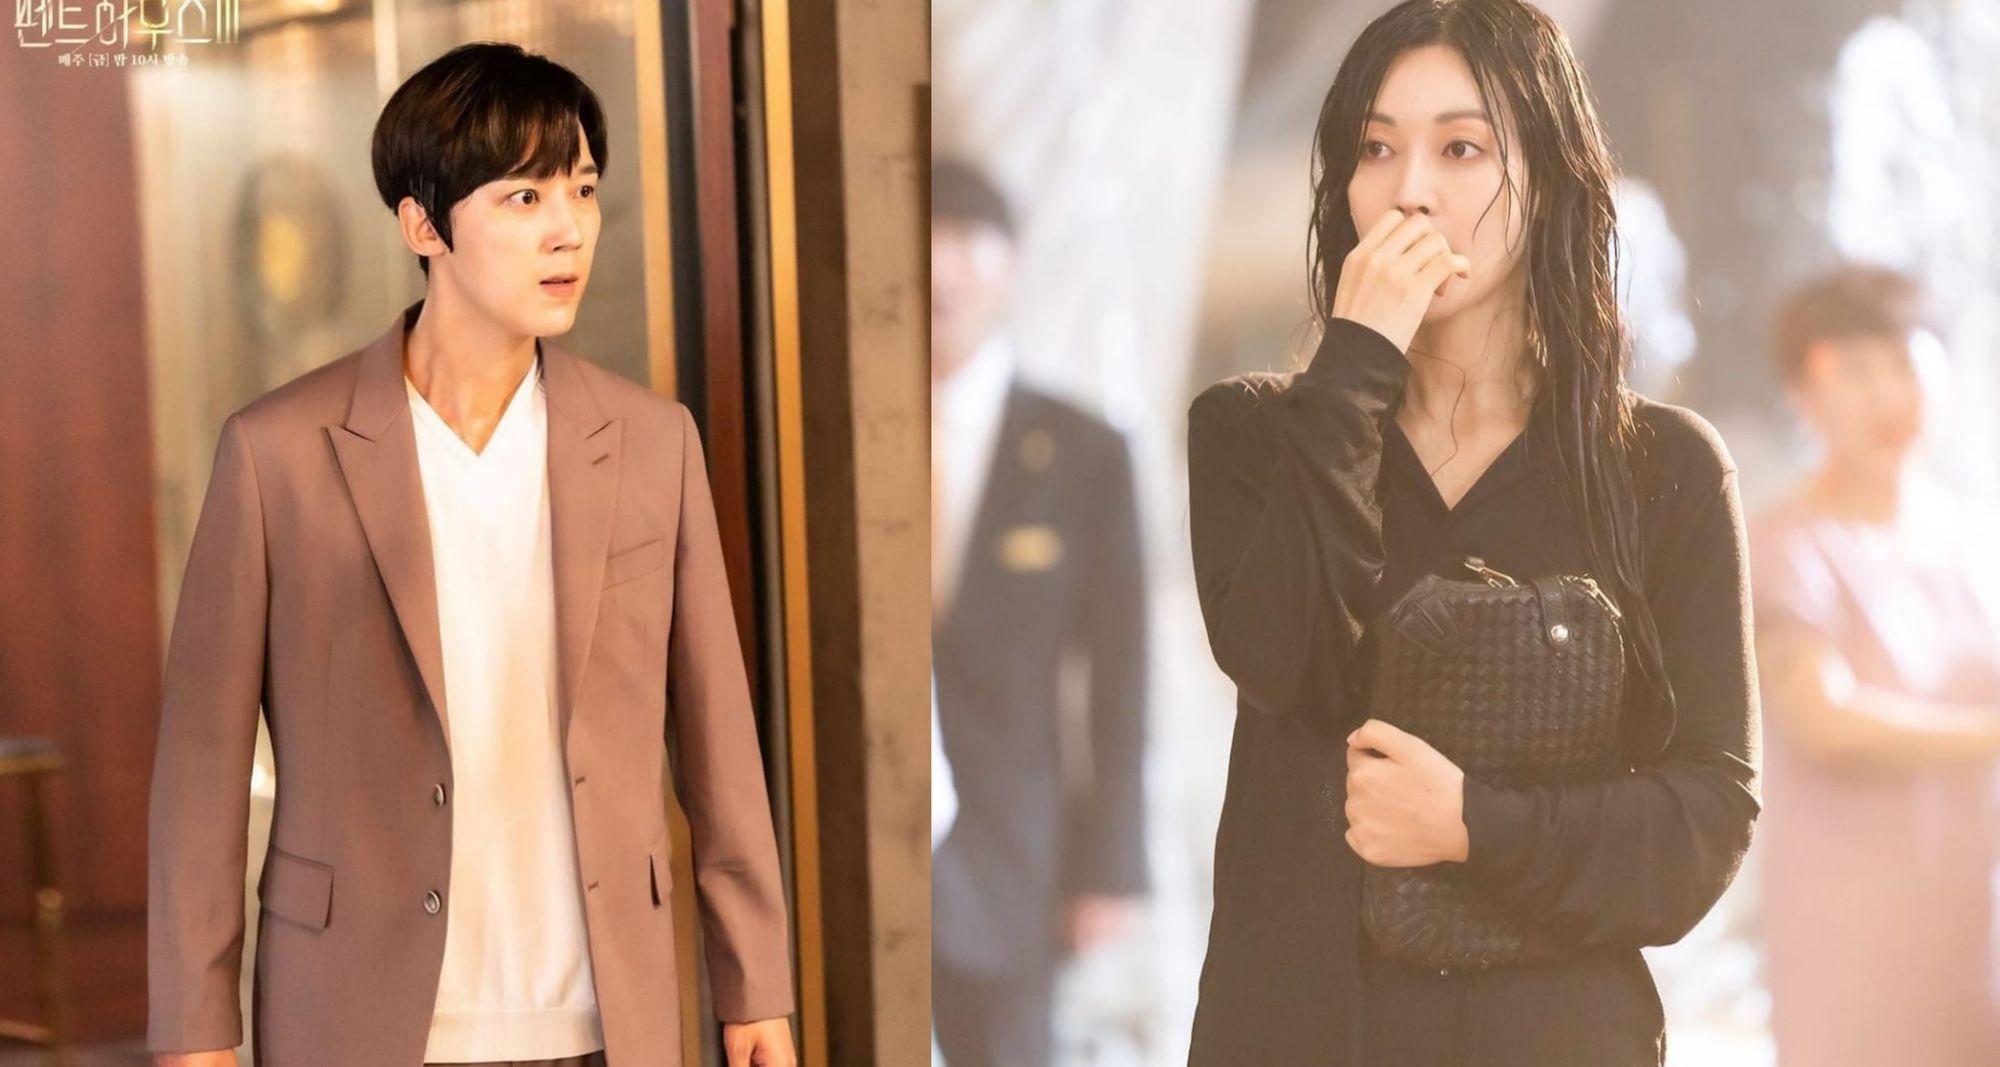 Penthouse 3: Will Ha Yoon Cheol and Cheon Seo Jin die?